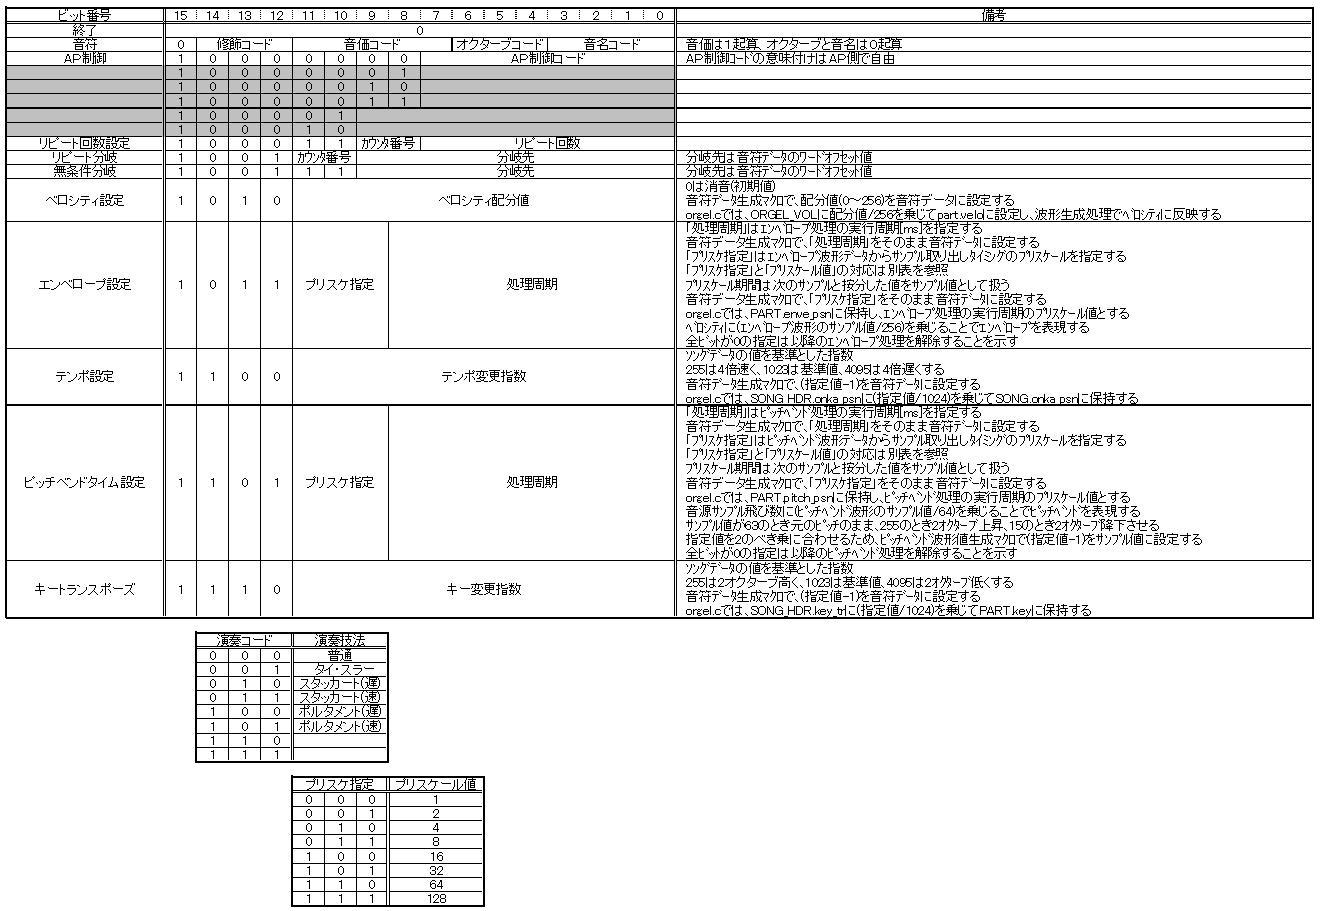 STM32電子オルゴール音符コードのフィールド定義(ピッチベンドサポート)